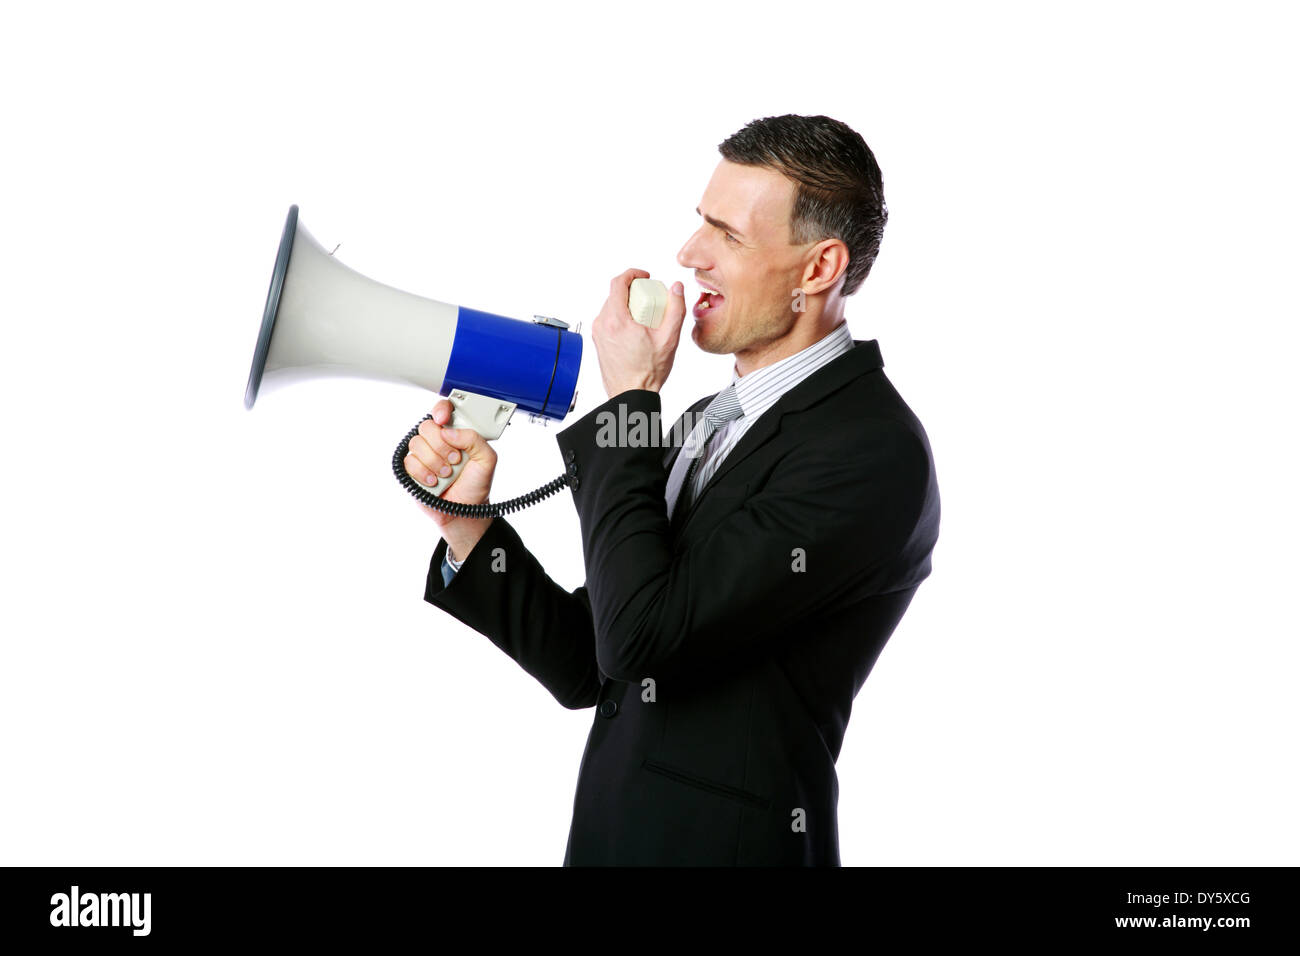 Portrait of businessman shouting through megaphone isolated on white background - Stock Image